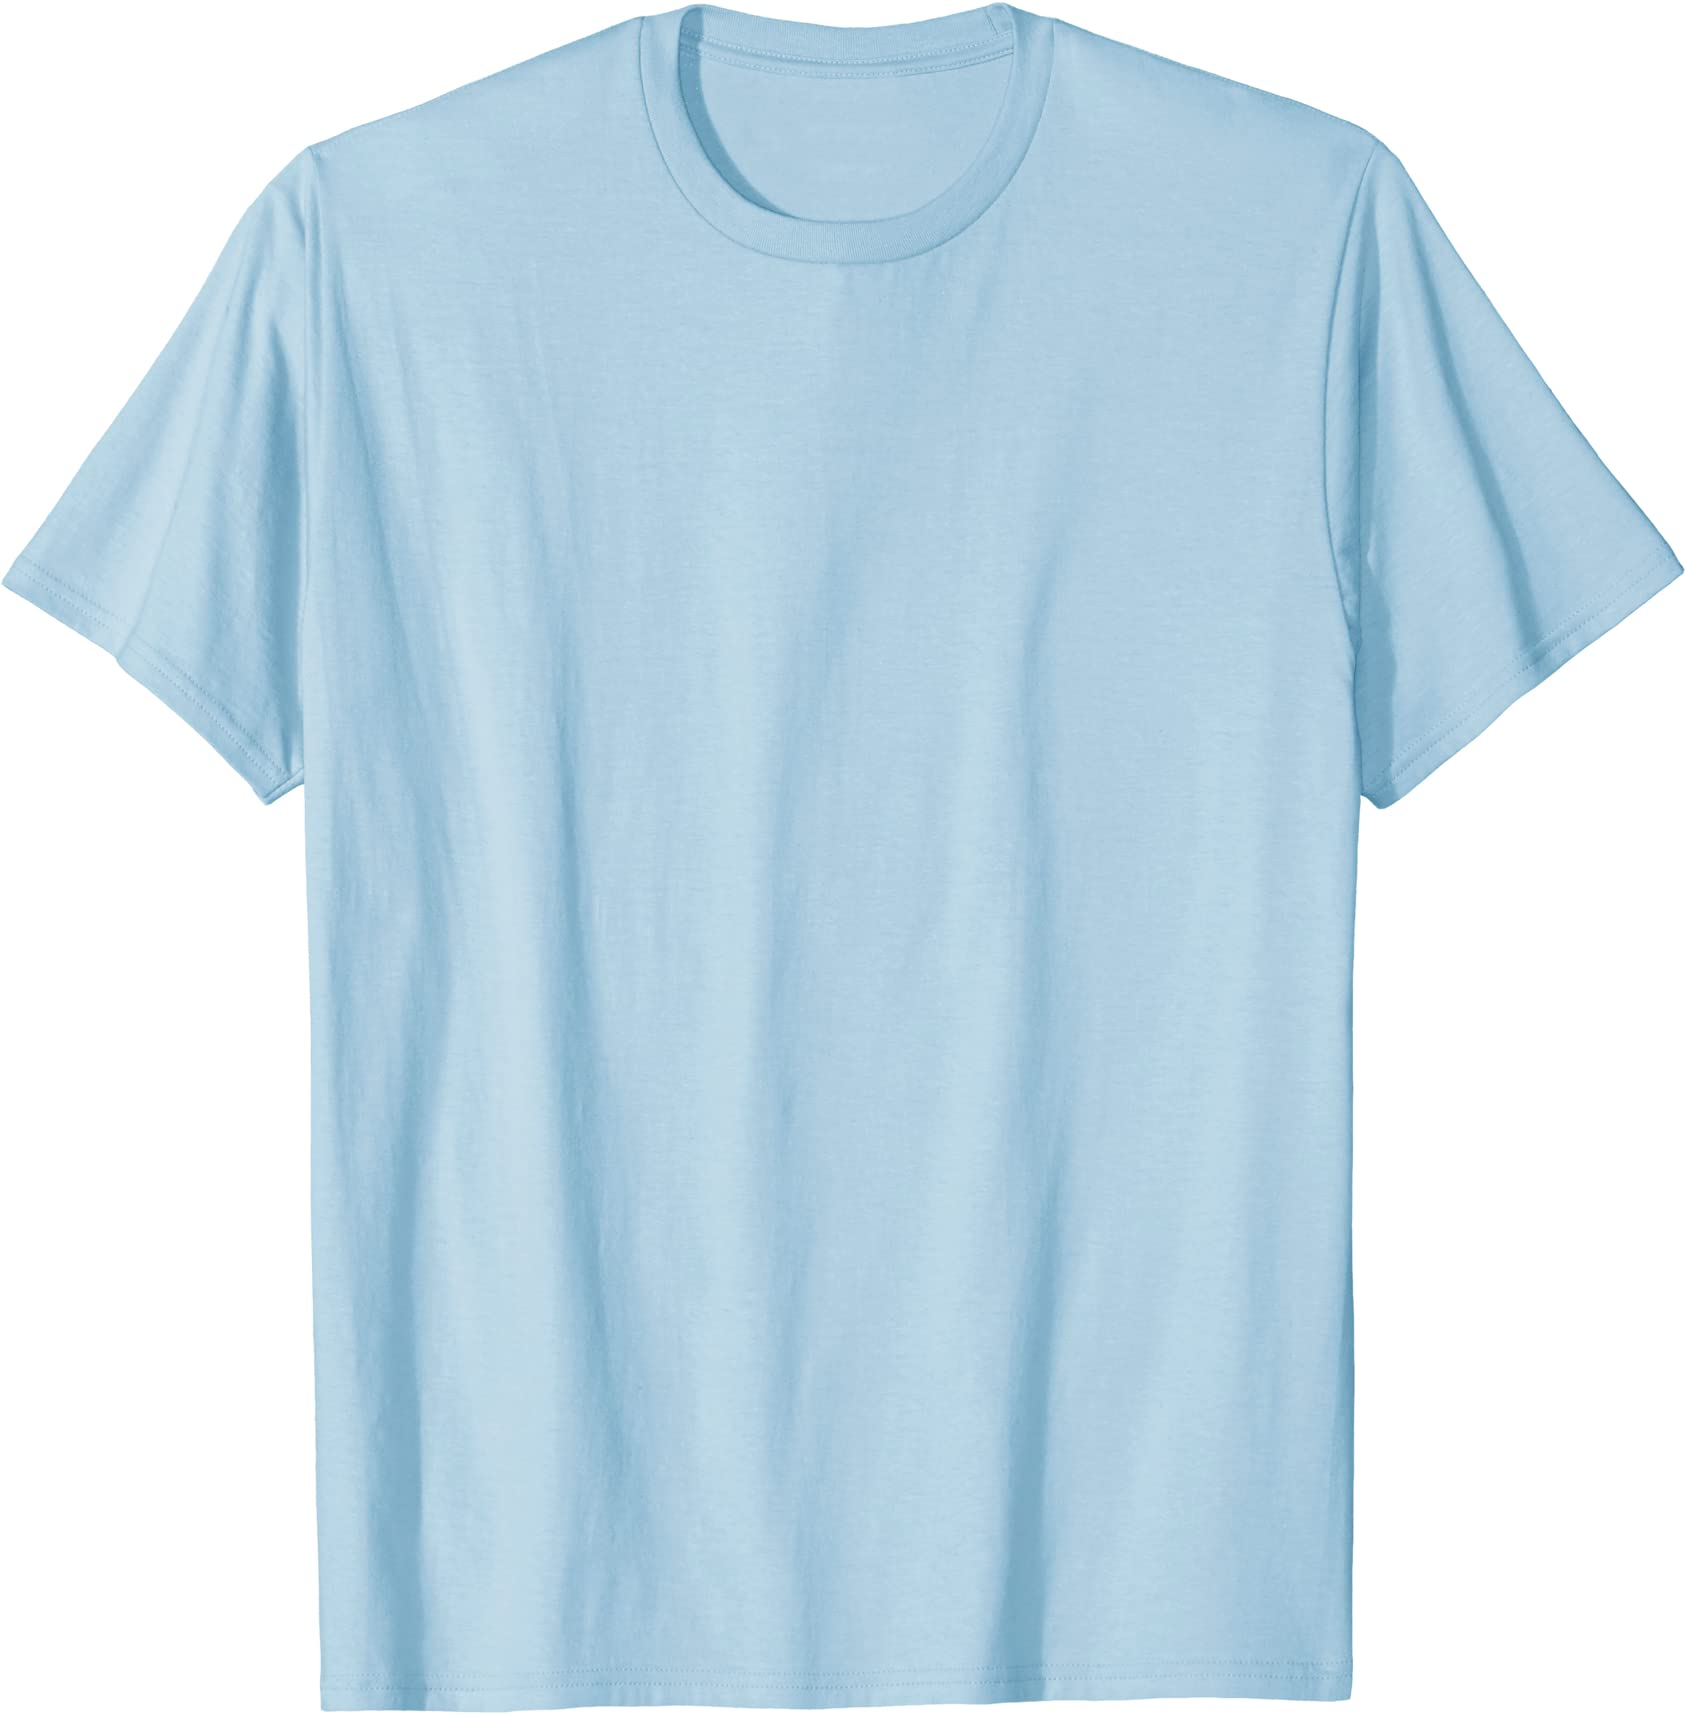 Easter Bunny Kids T-Shirt Rabbit Funny Cute Novelty Boys Girls Gift Tshirt